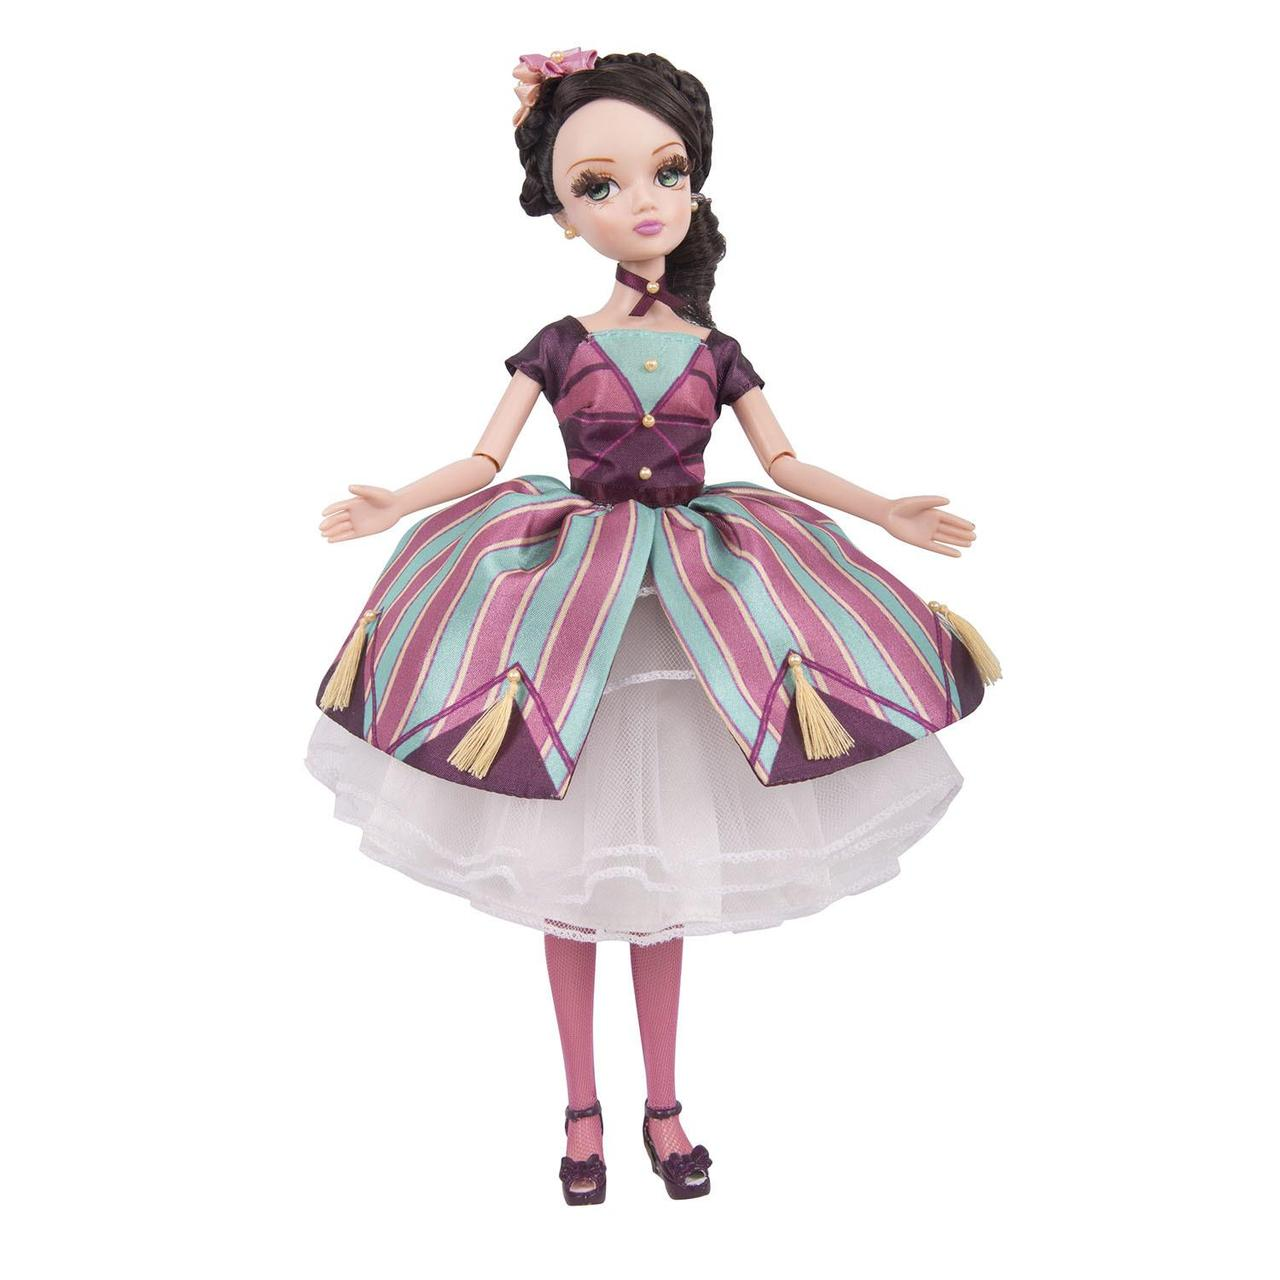 "Кукла Sonya Rose, серия ""Gold collection"" платье Алиса (Gulliver, Россия) - фото 3"